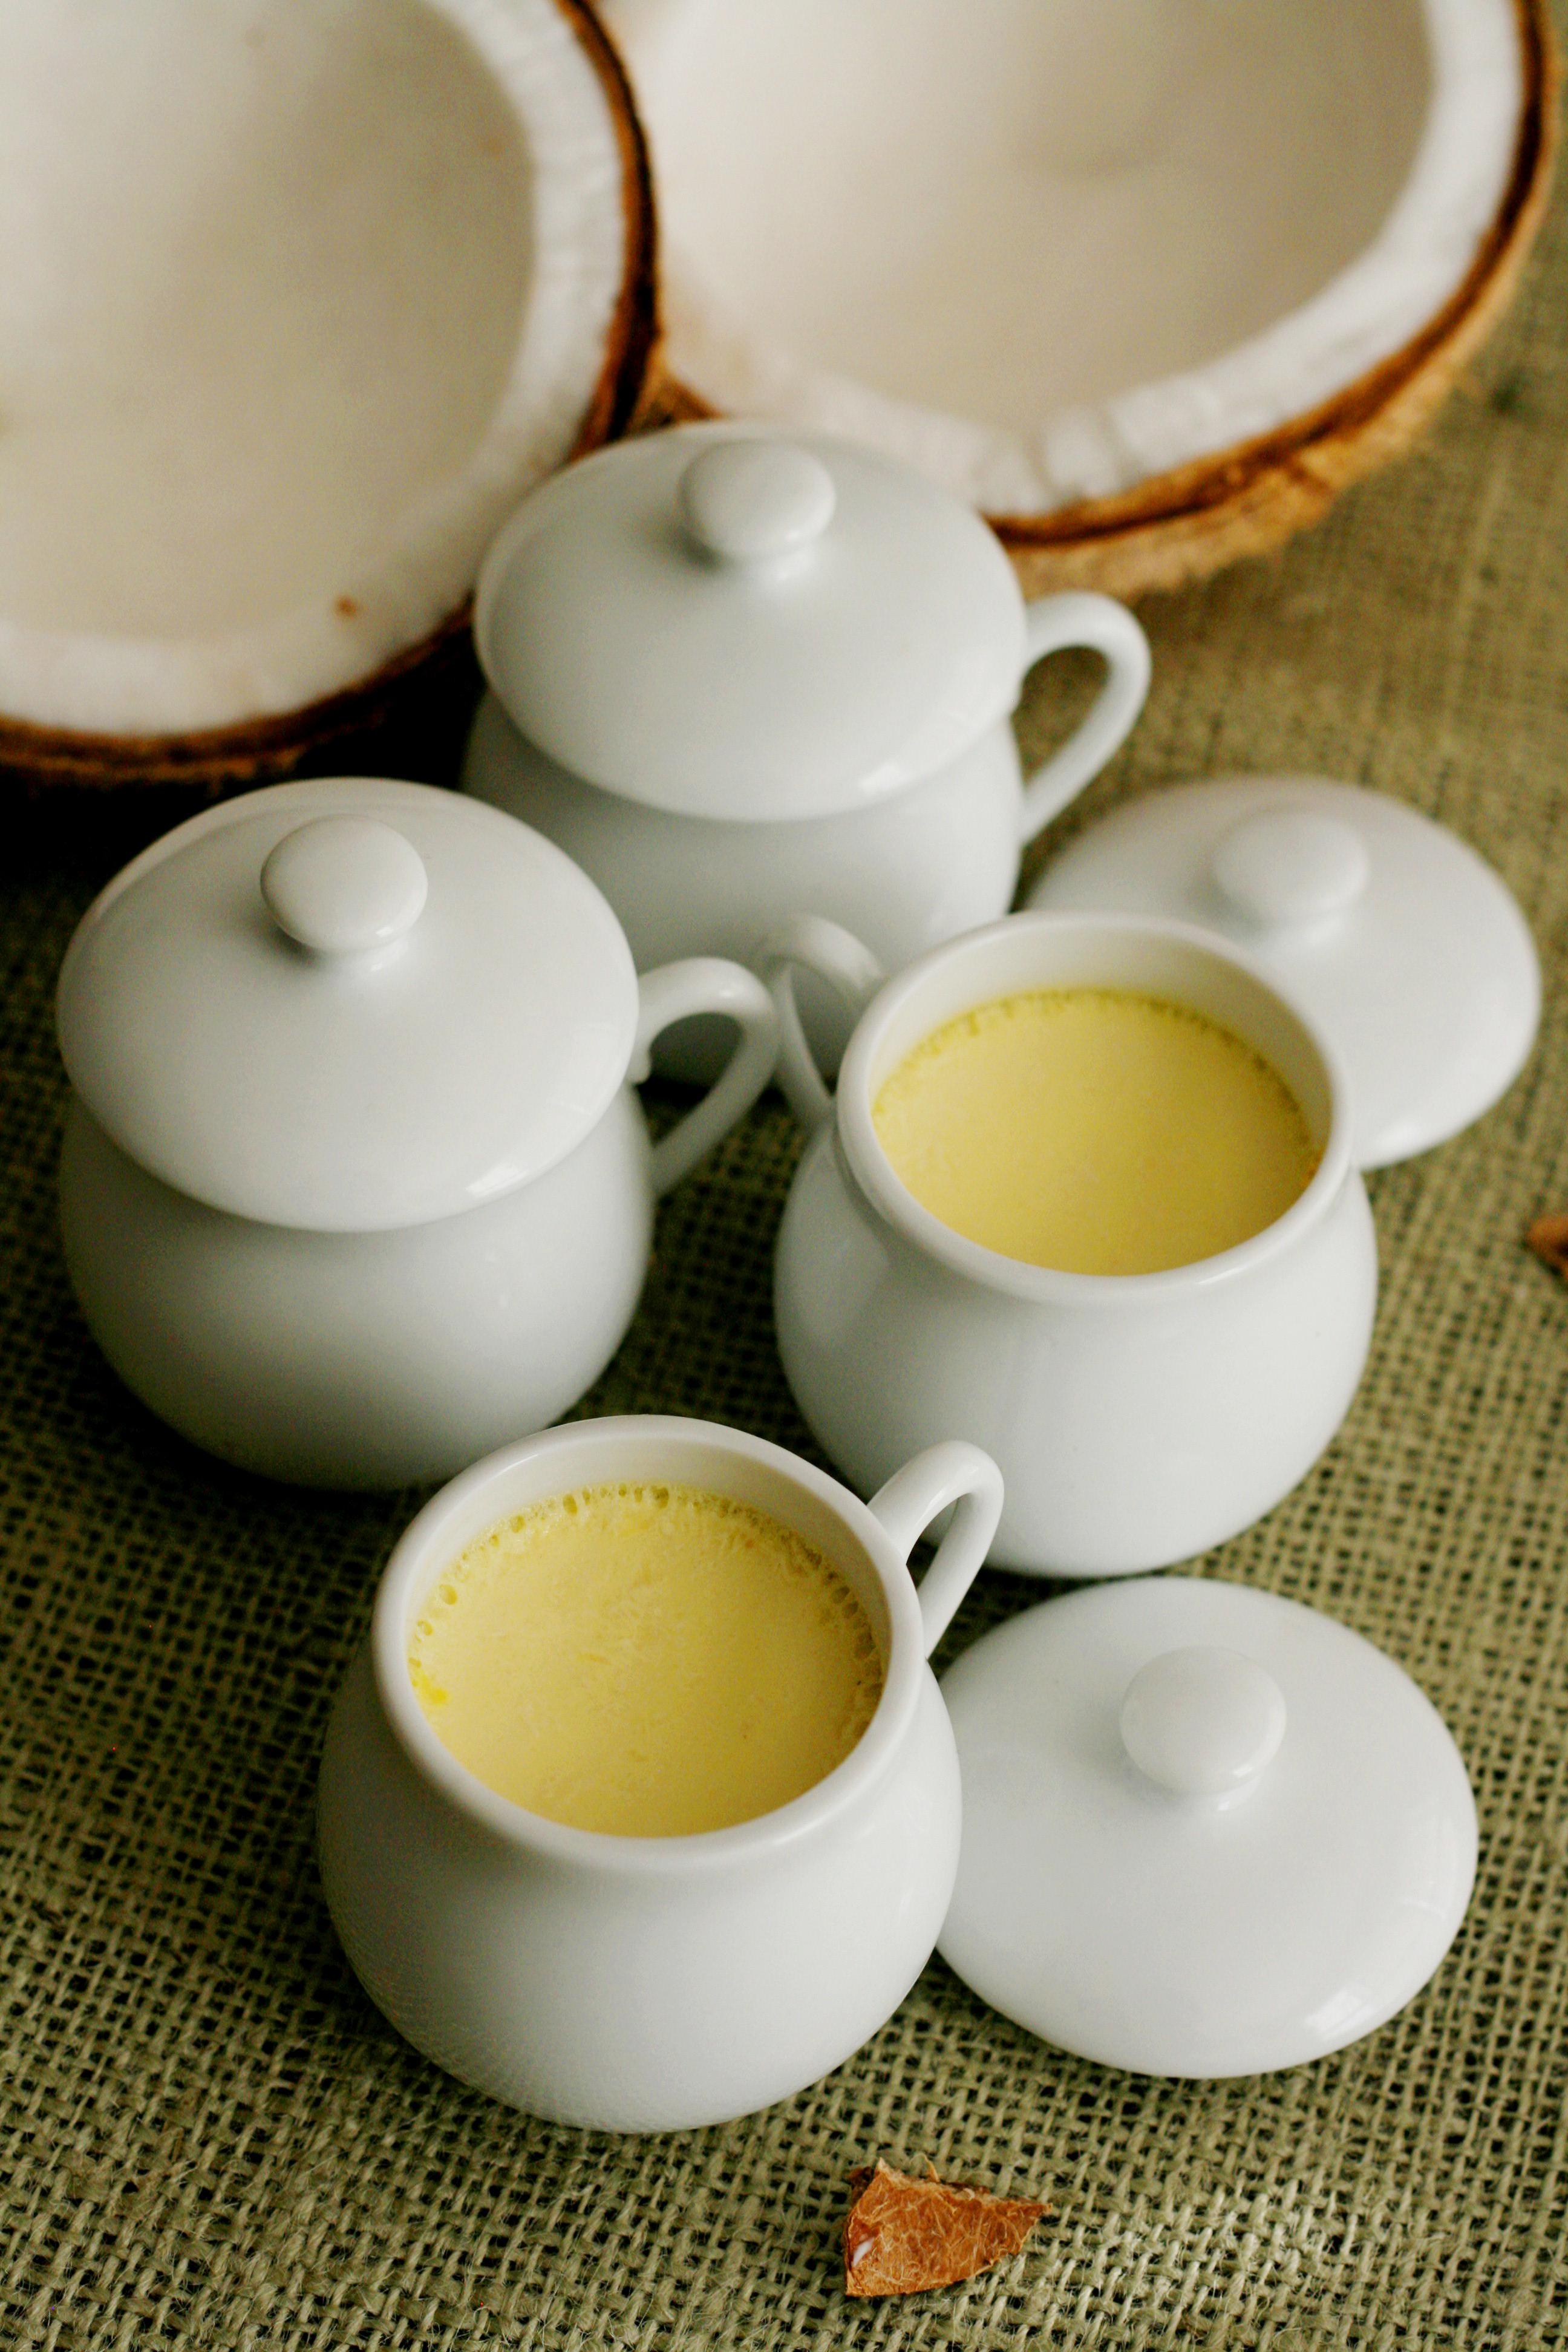 ... de creme pot de creme cups creme pots de creme a l orange yuzu pots de